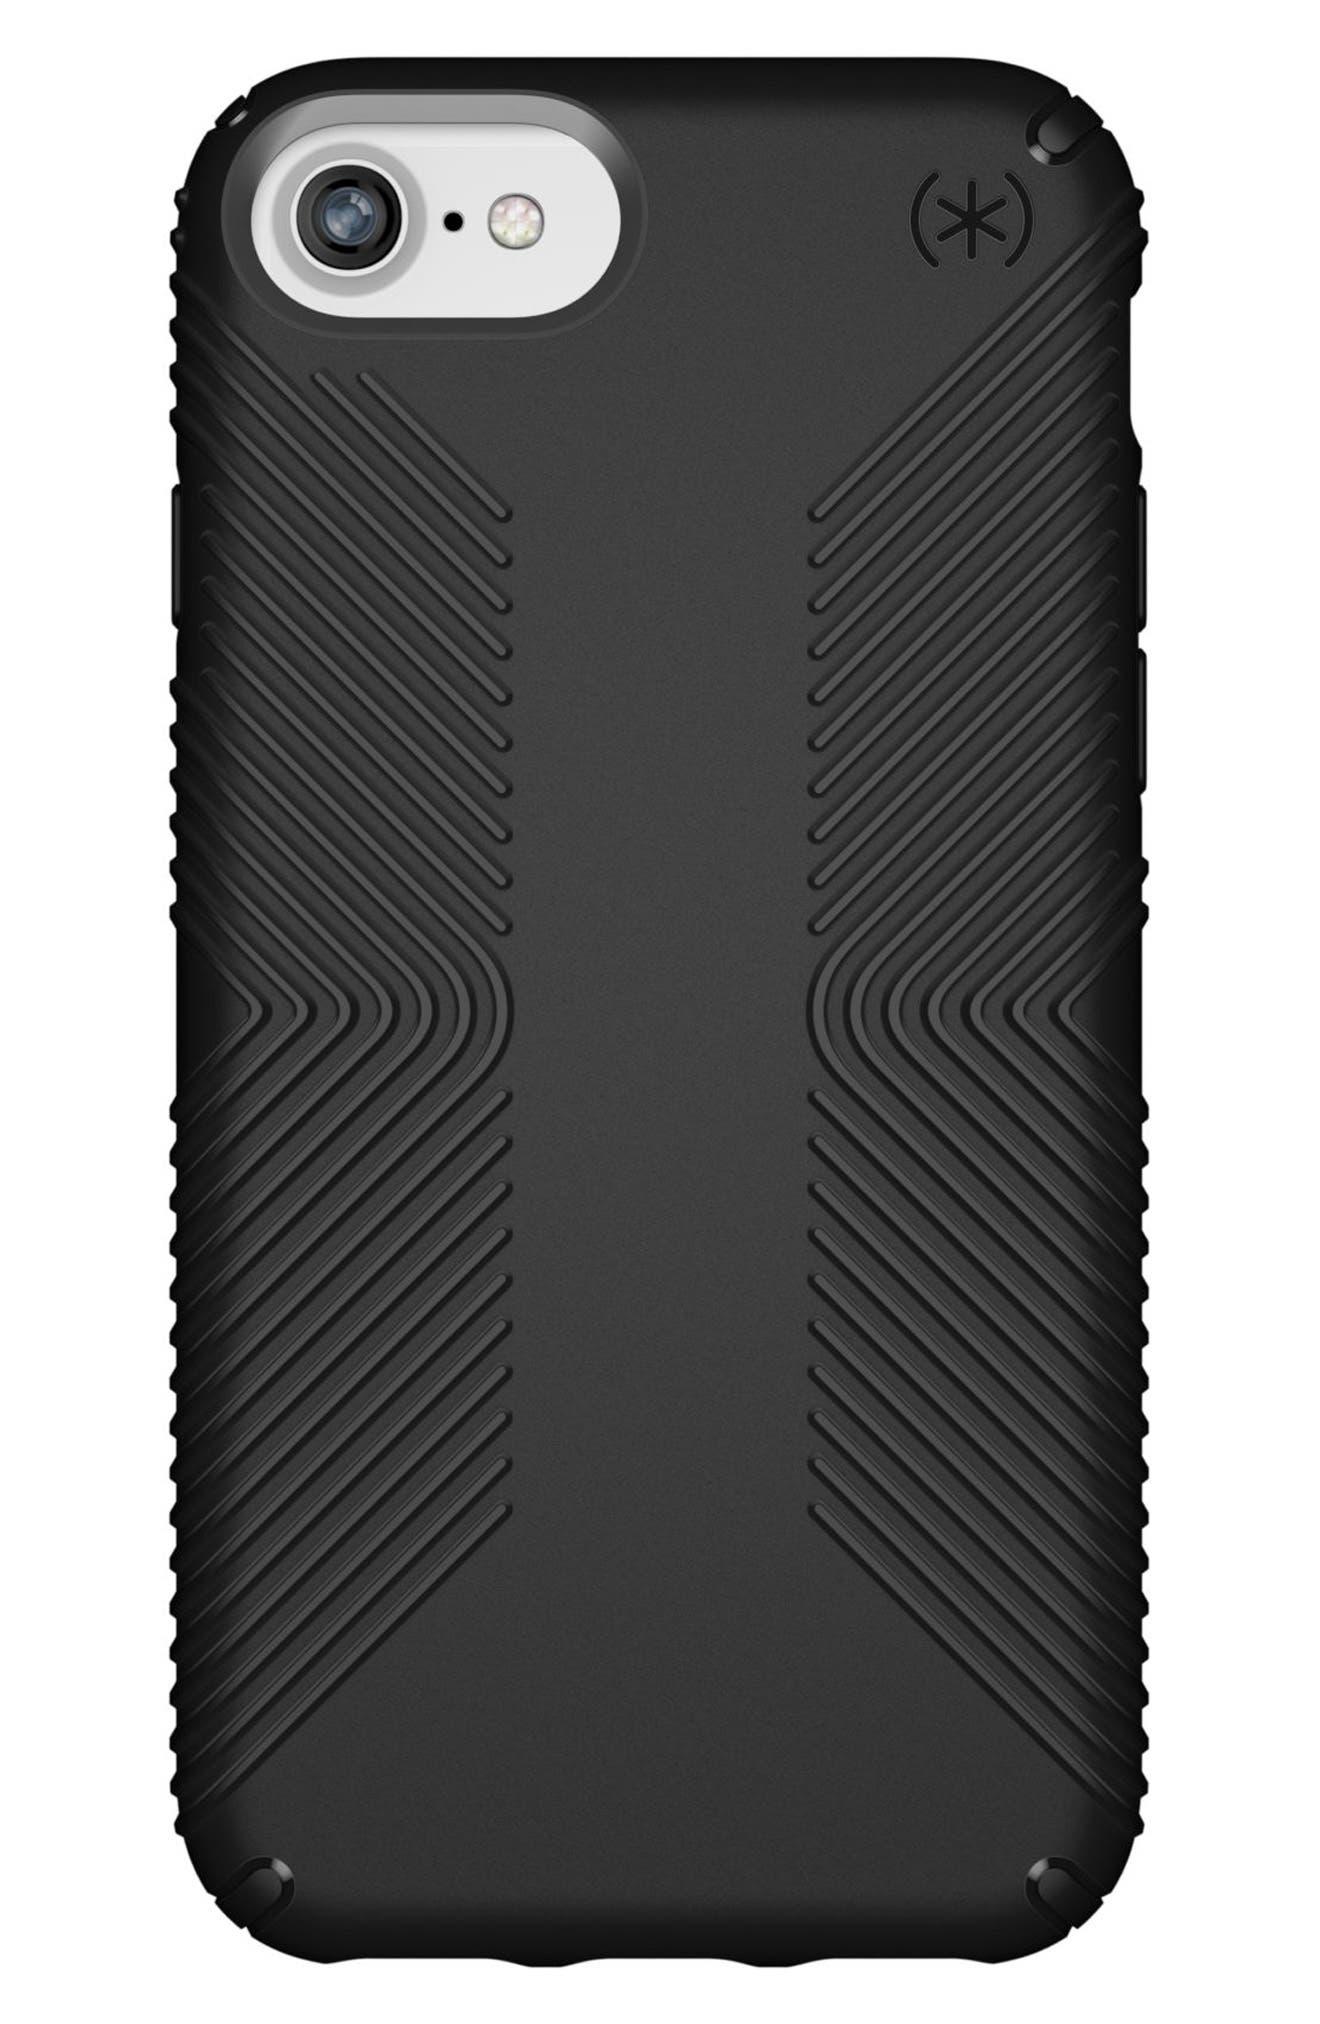 SPECK Grip iPhone 6/6s/7/8 Case, Main, color, 001